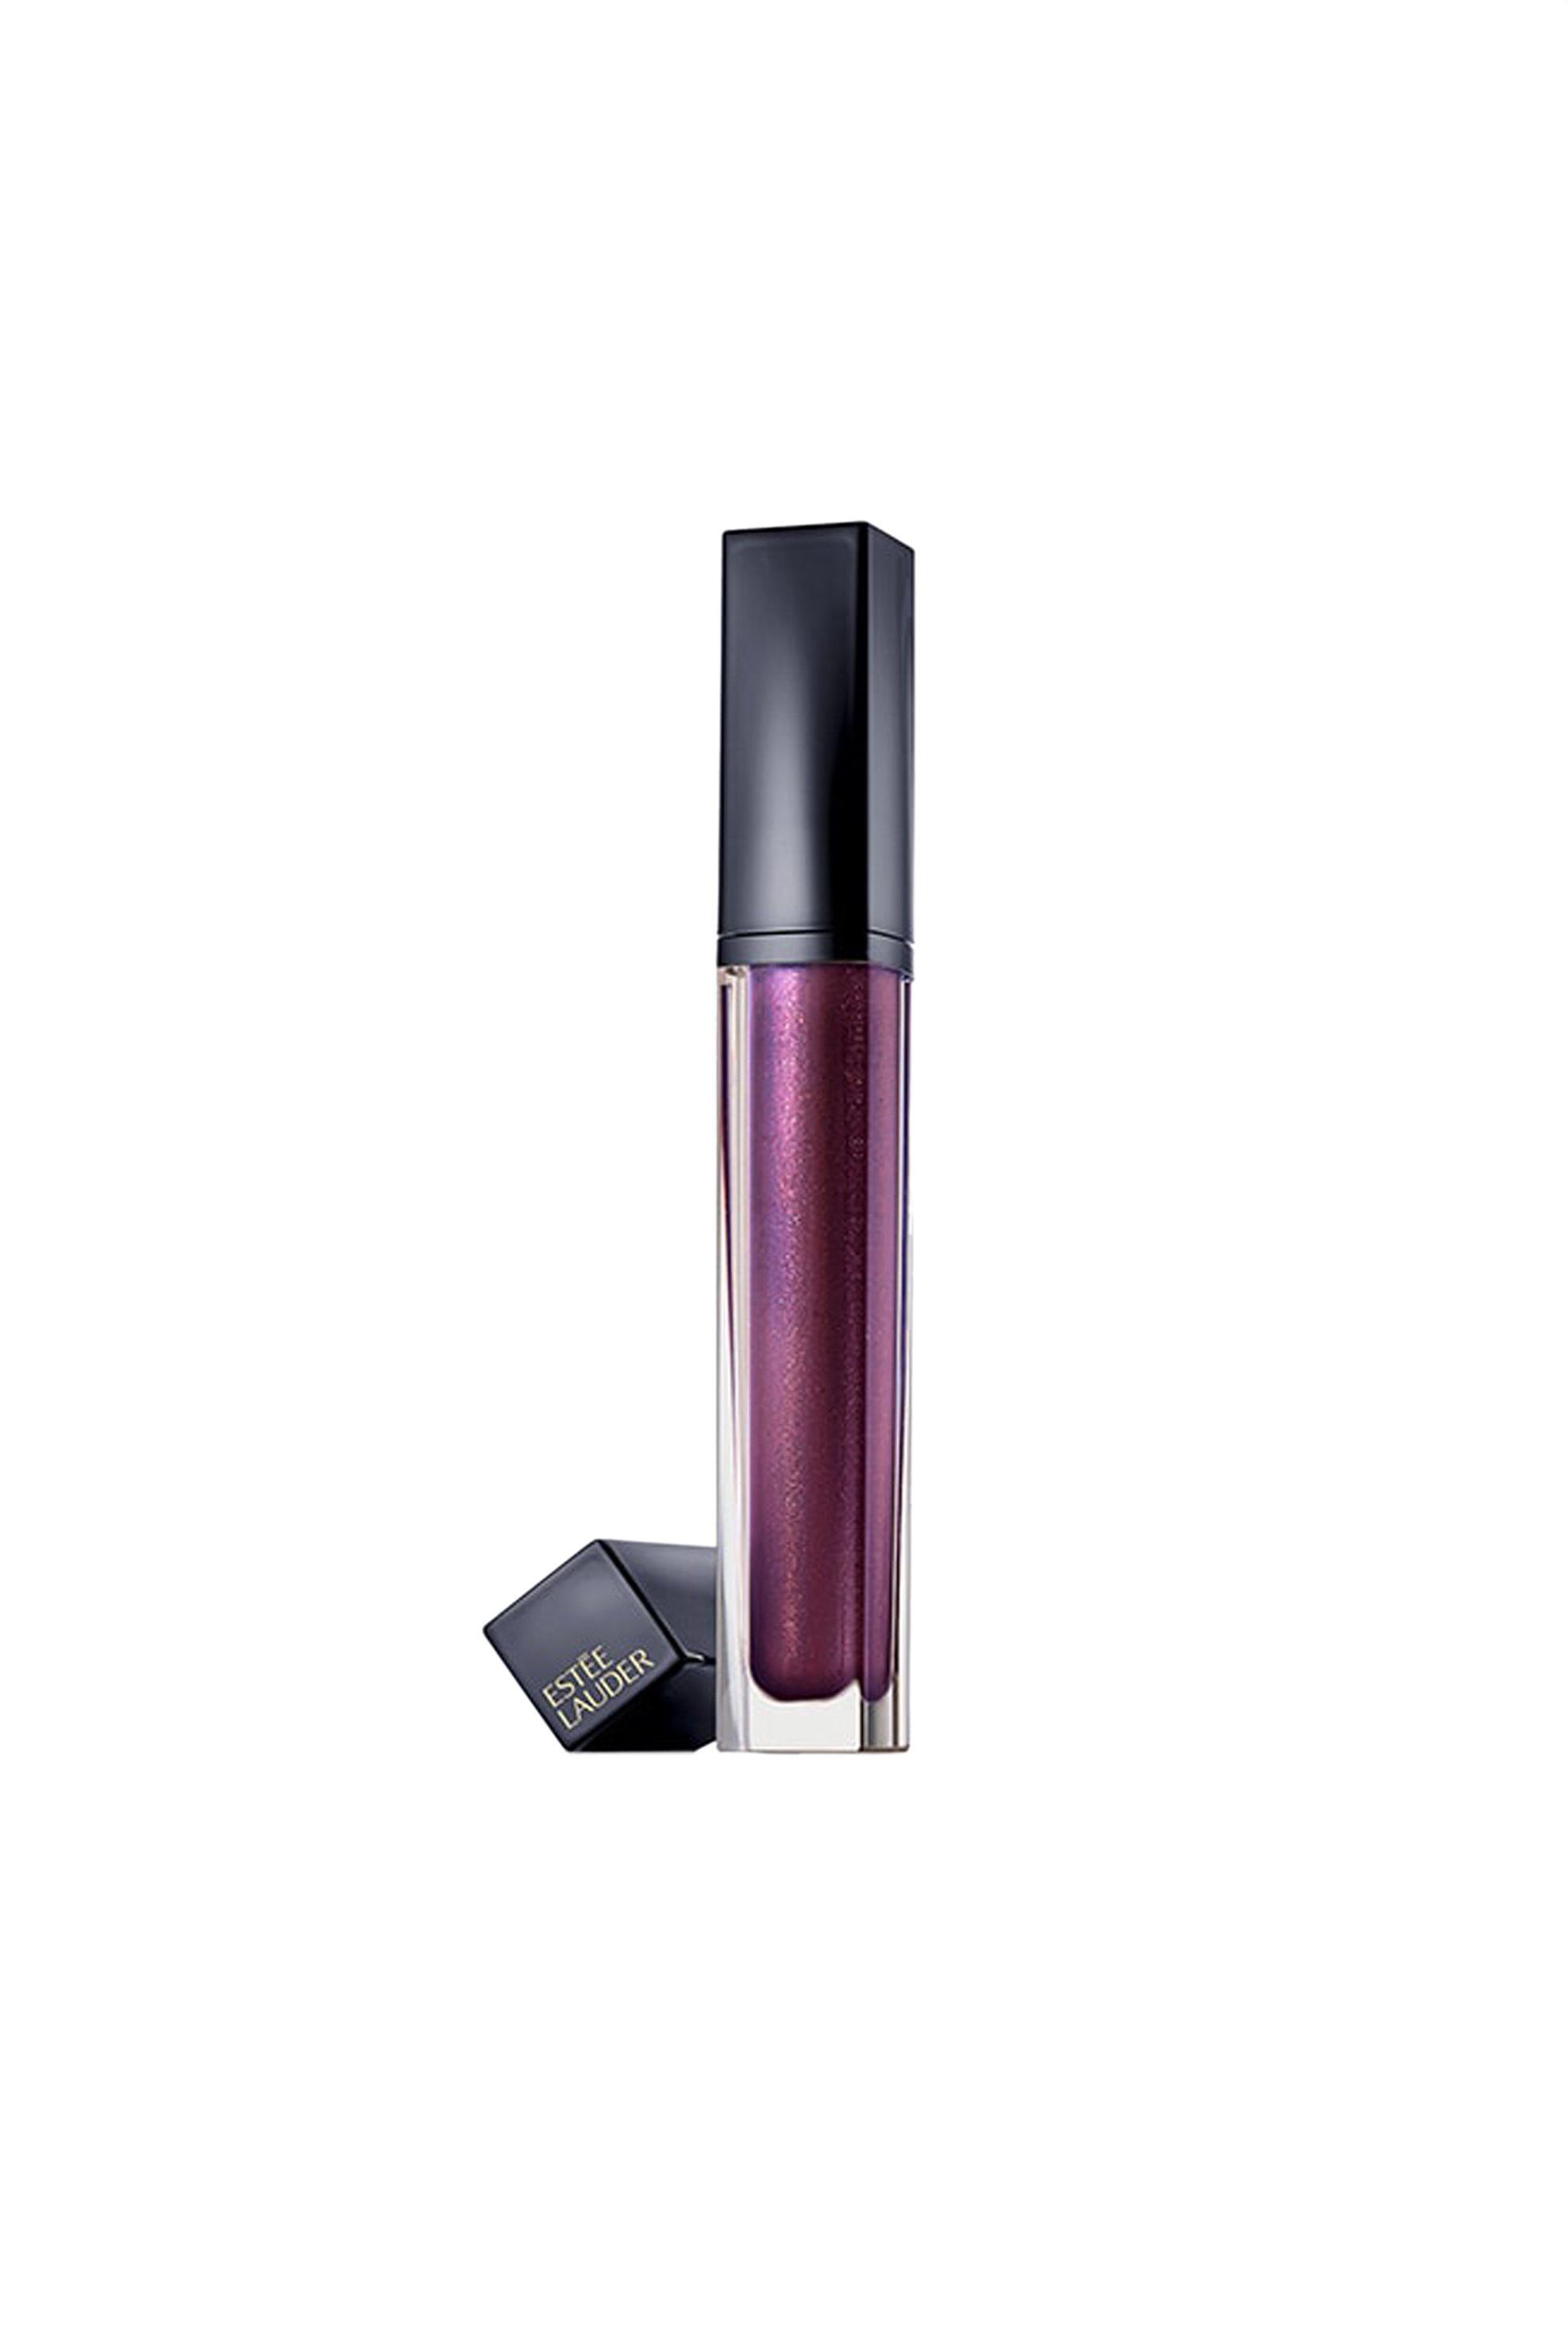 Estée Lauder Pure Color Envy Sculpting Gloss 440 Berry Provocative 5,8 ml - R410 ομορφια   καλλυντικα επιλεκτικησ   μακιγιάζ   χείλη   lip gloss   balms